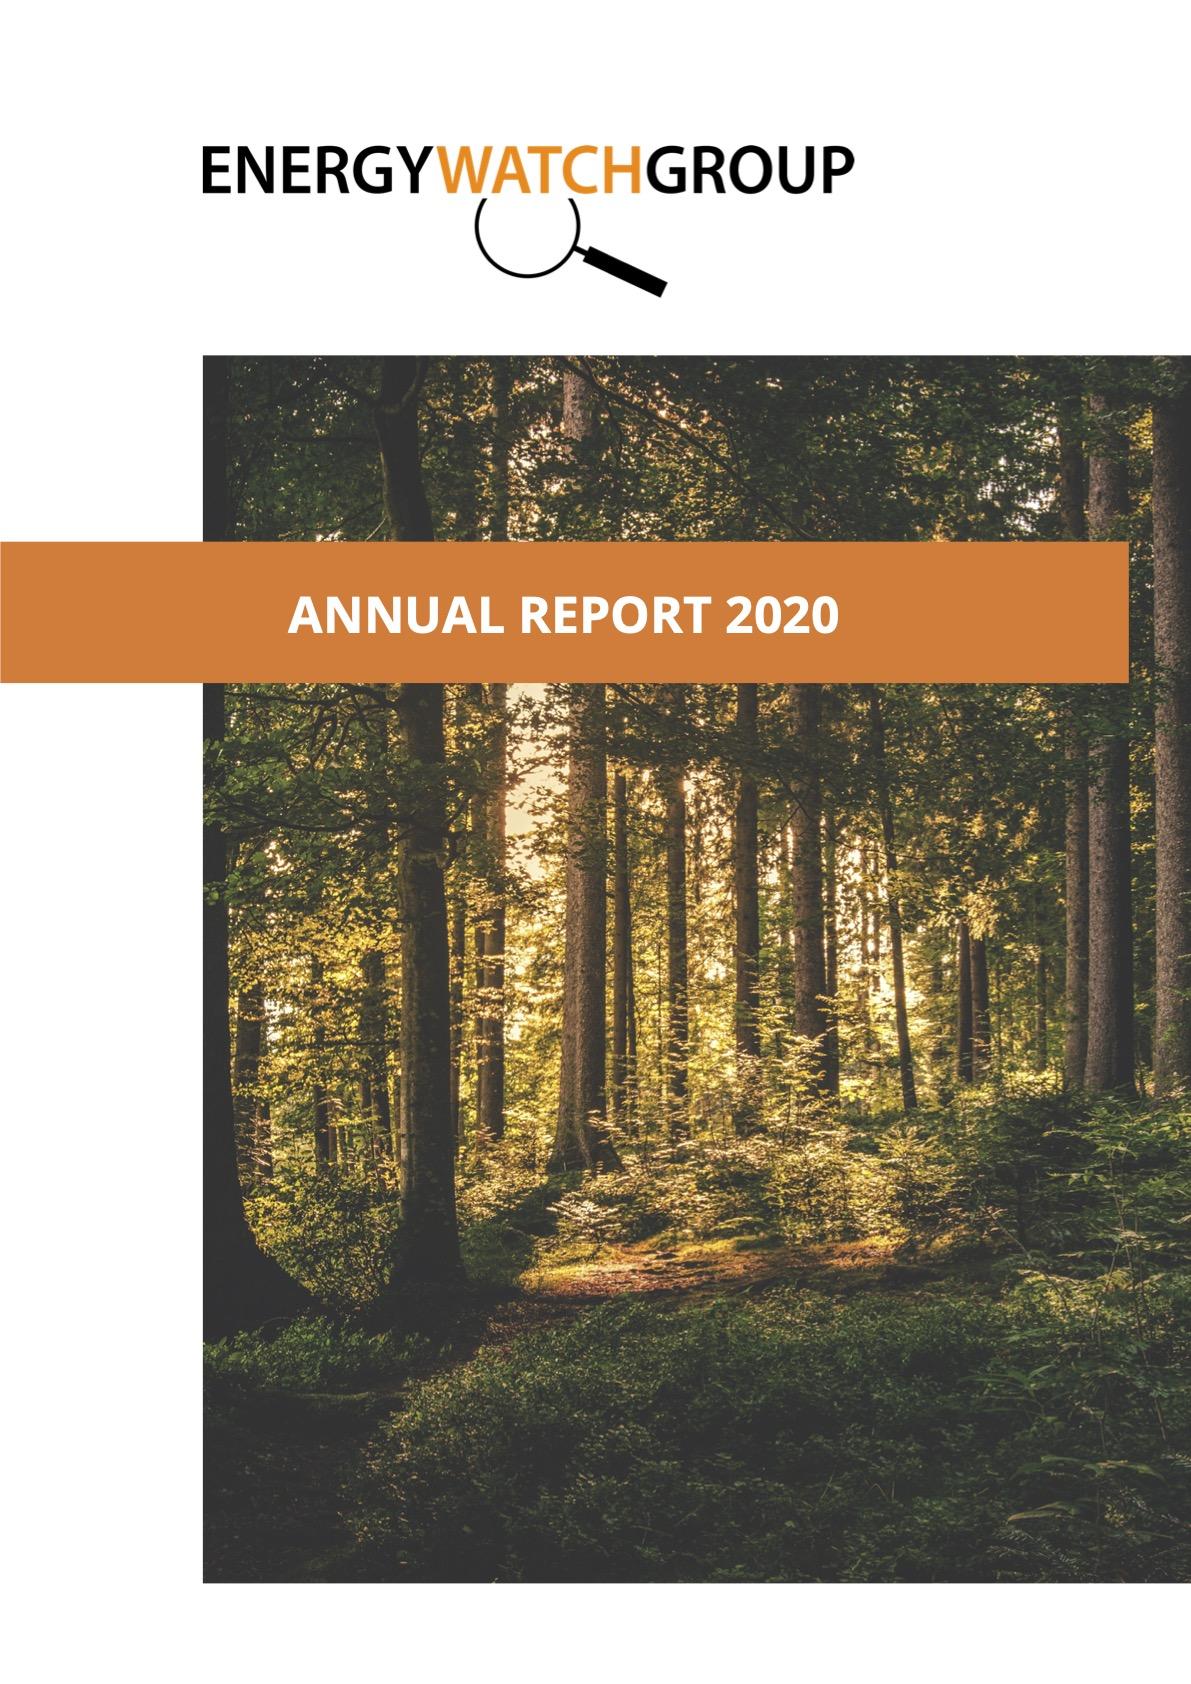 Annual Report 2020 English